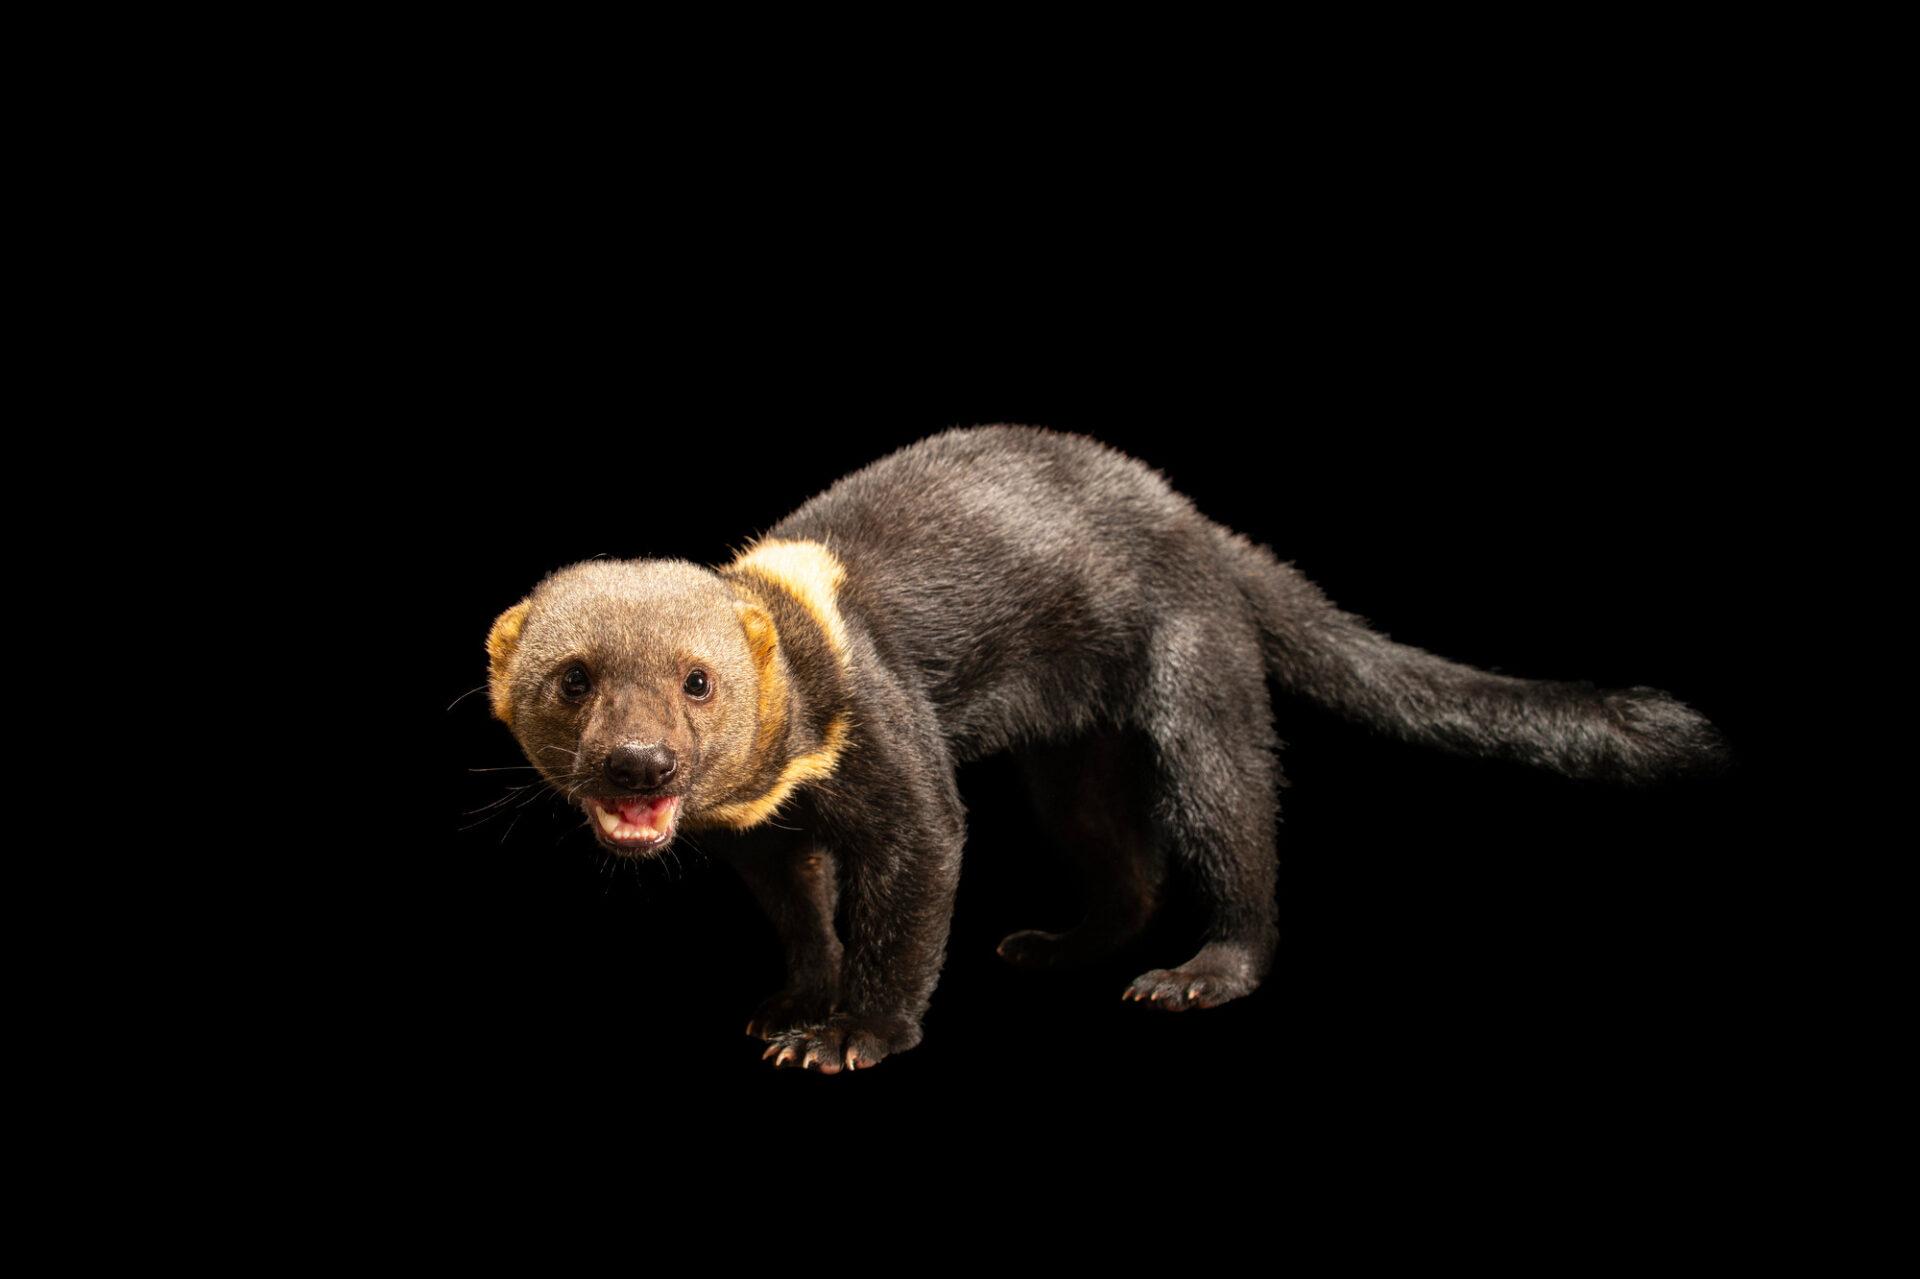 Photo: A tayra (Eira barbara madeirensis) at Zoologico de Quito.